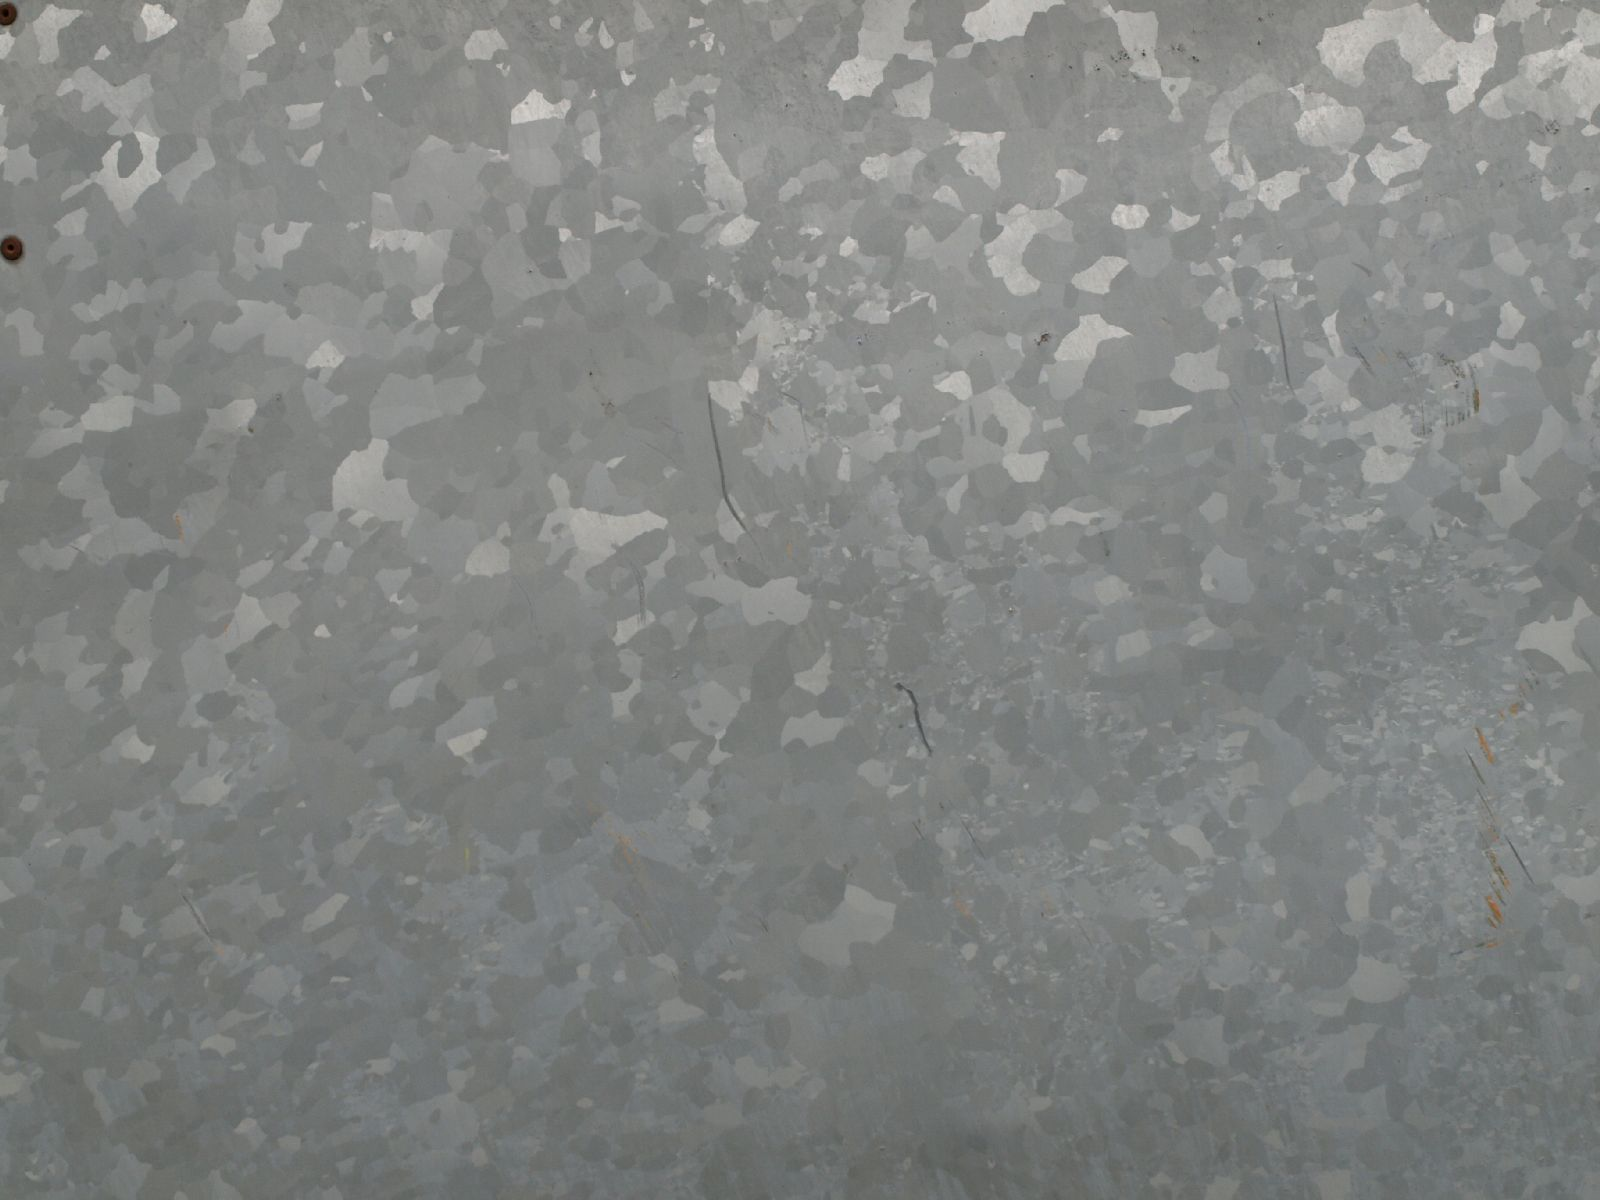 Metall_Textur_A_P4131177